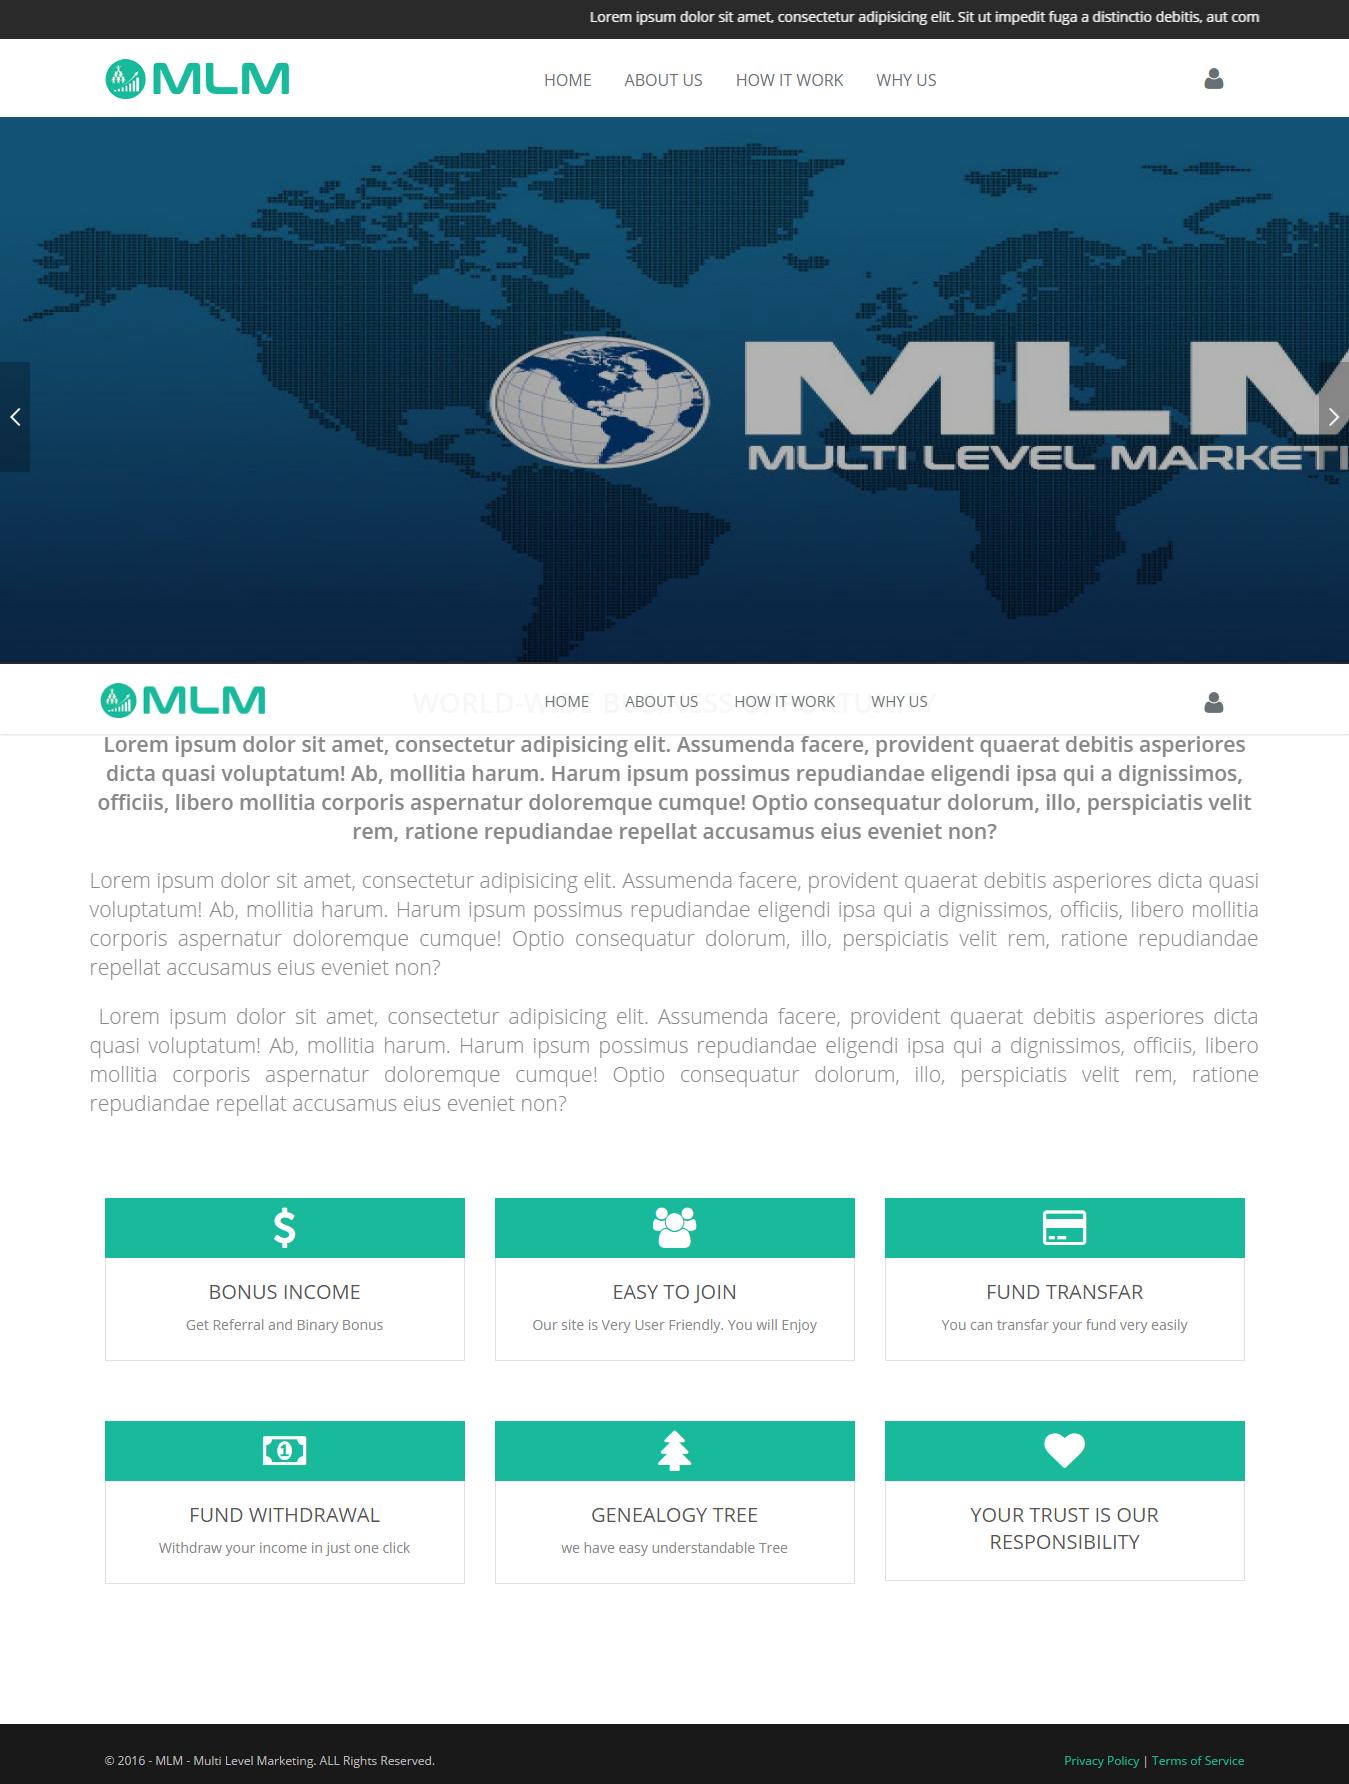 MMN MLM - Sistema de Marketing Multinível